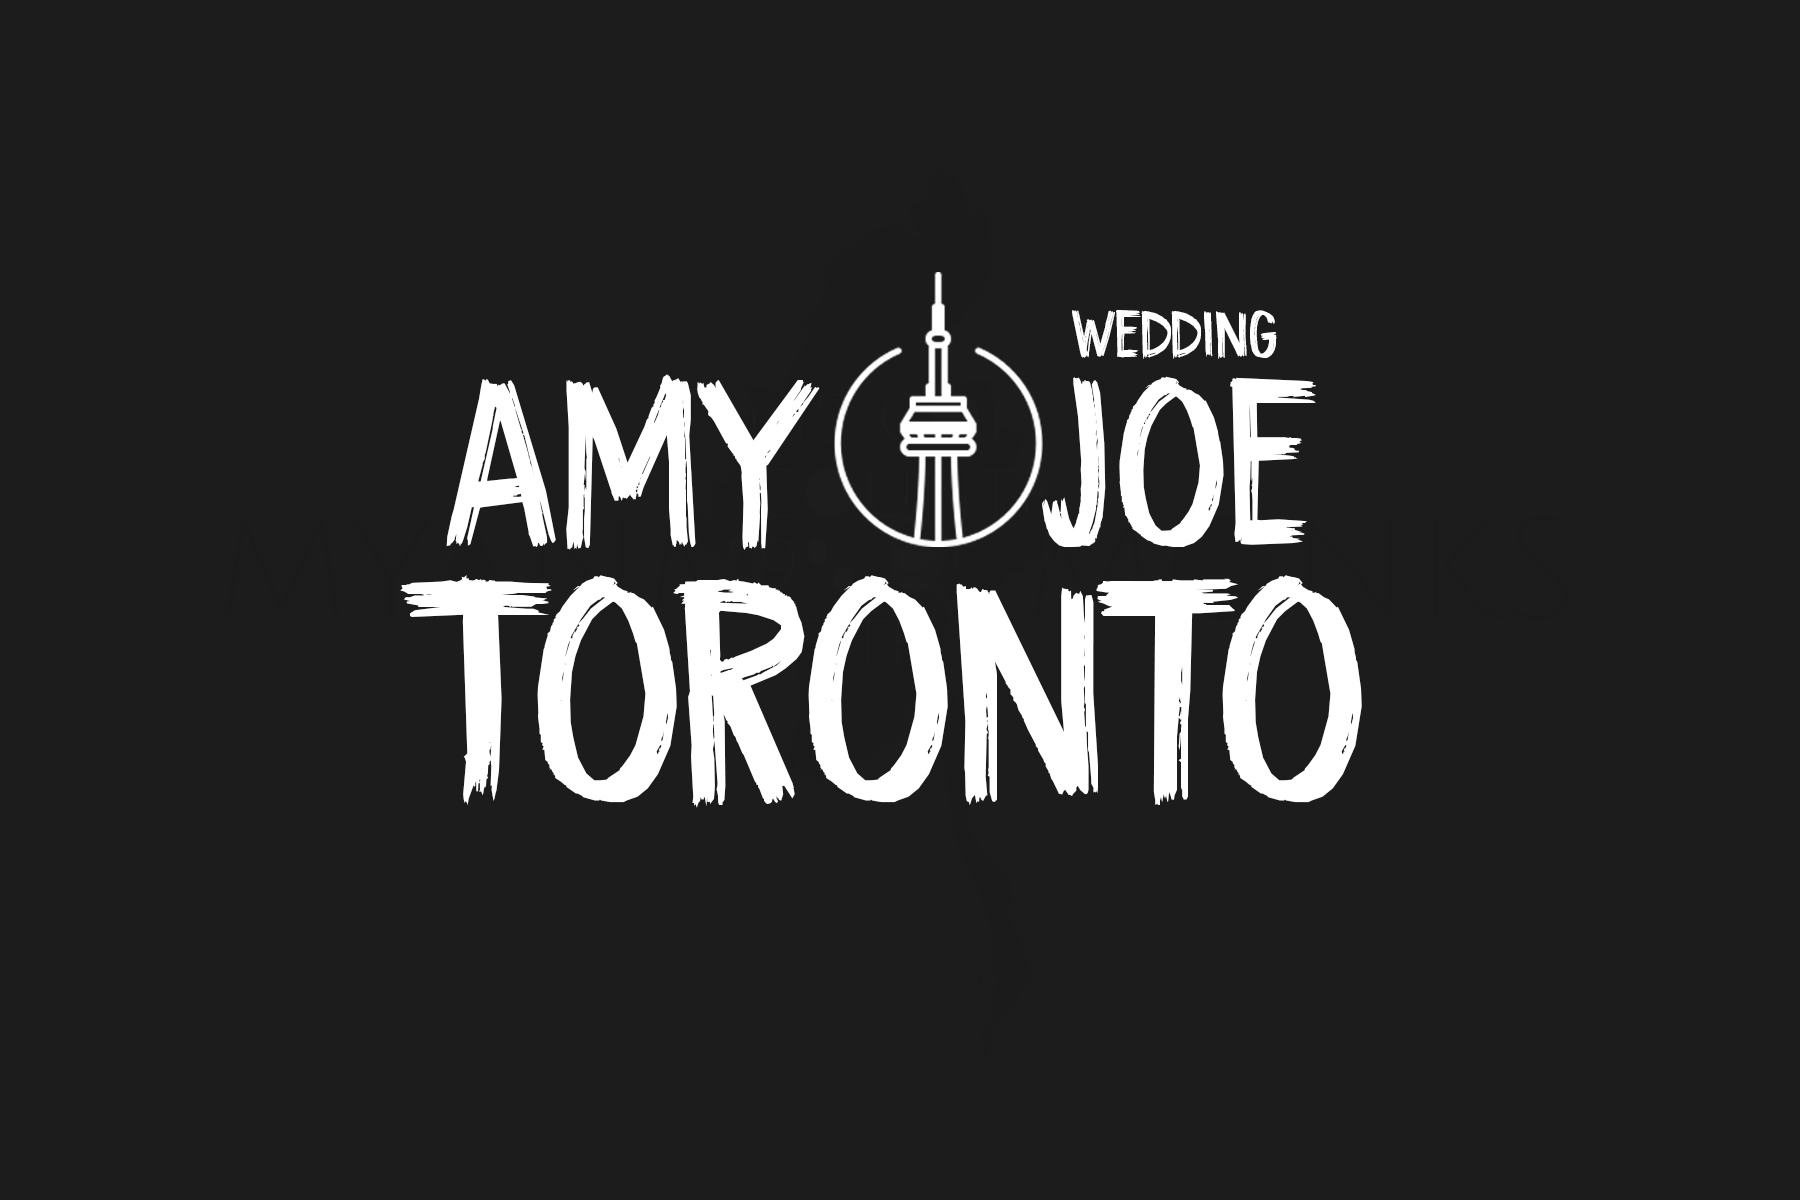 Amy & Joe Wedding intro (DK Coal)WED.jpg